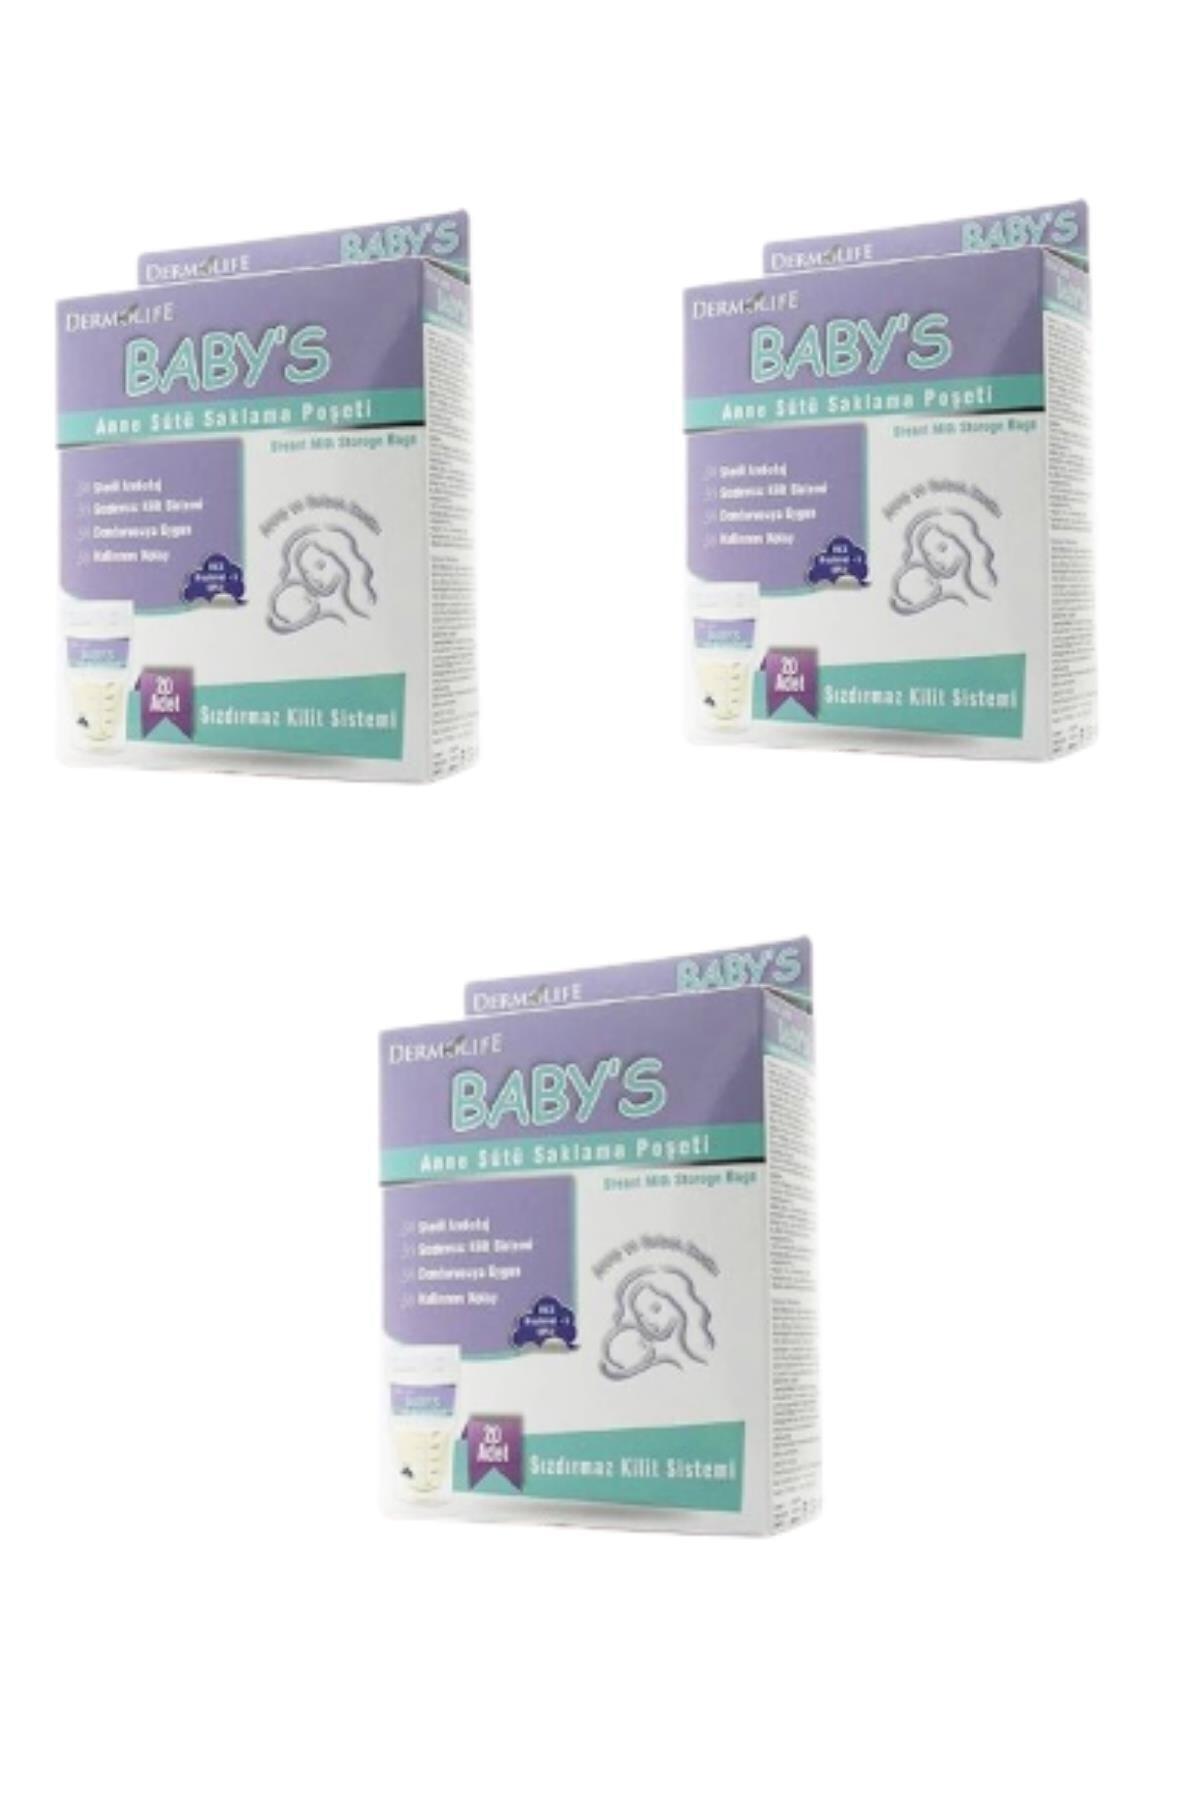 Dermolife Baby S Anne Sütü Saklama Poşeti 3 Adet 1